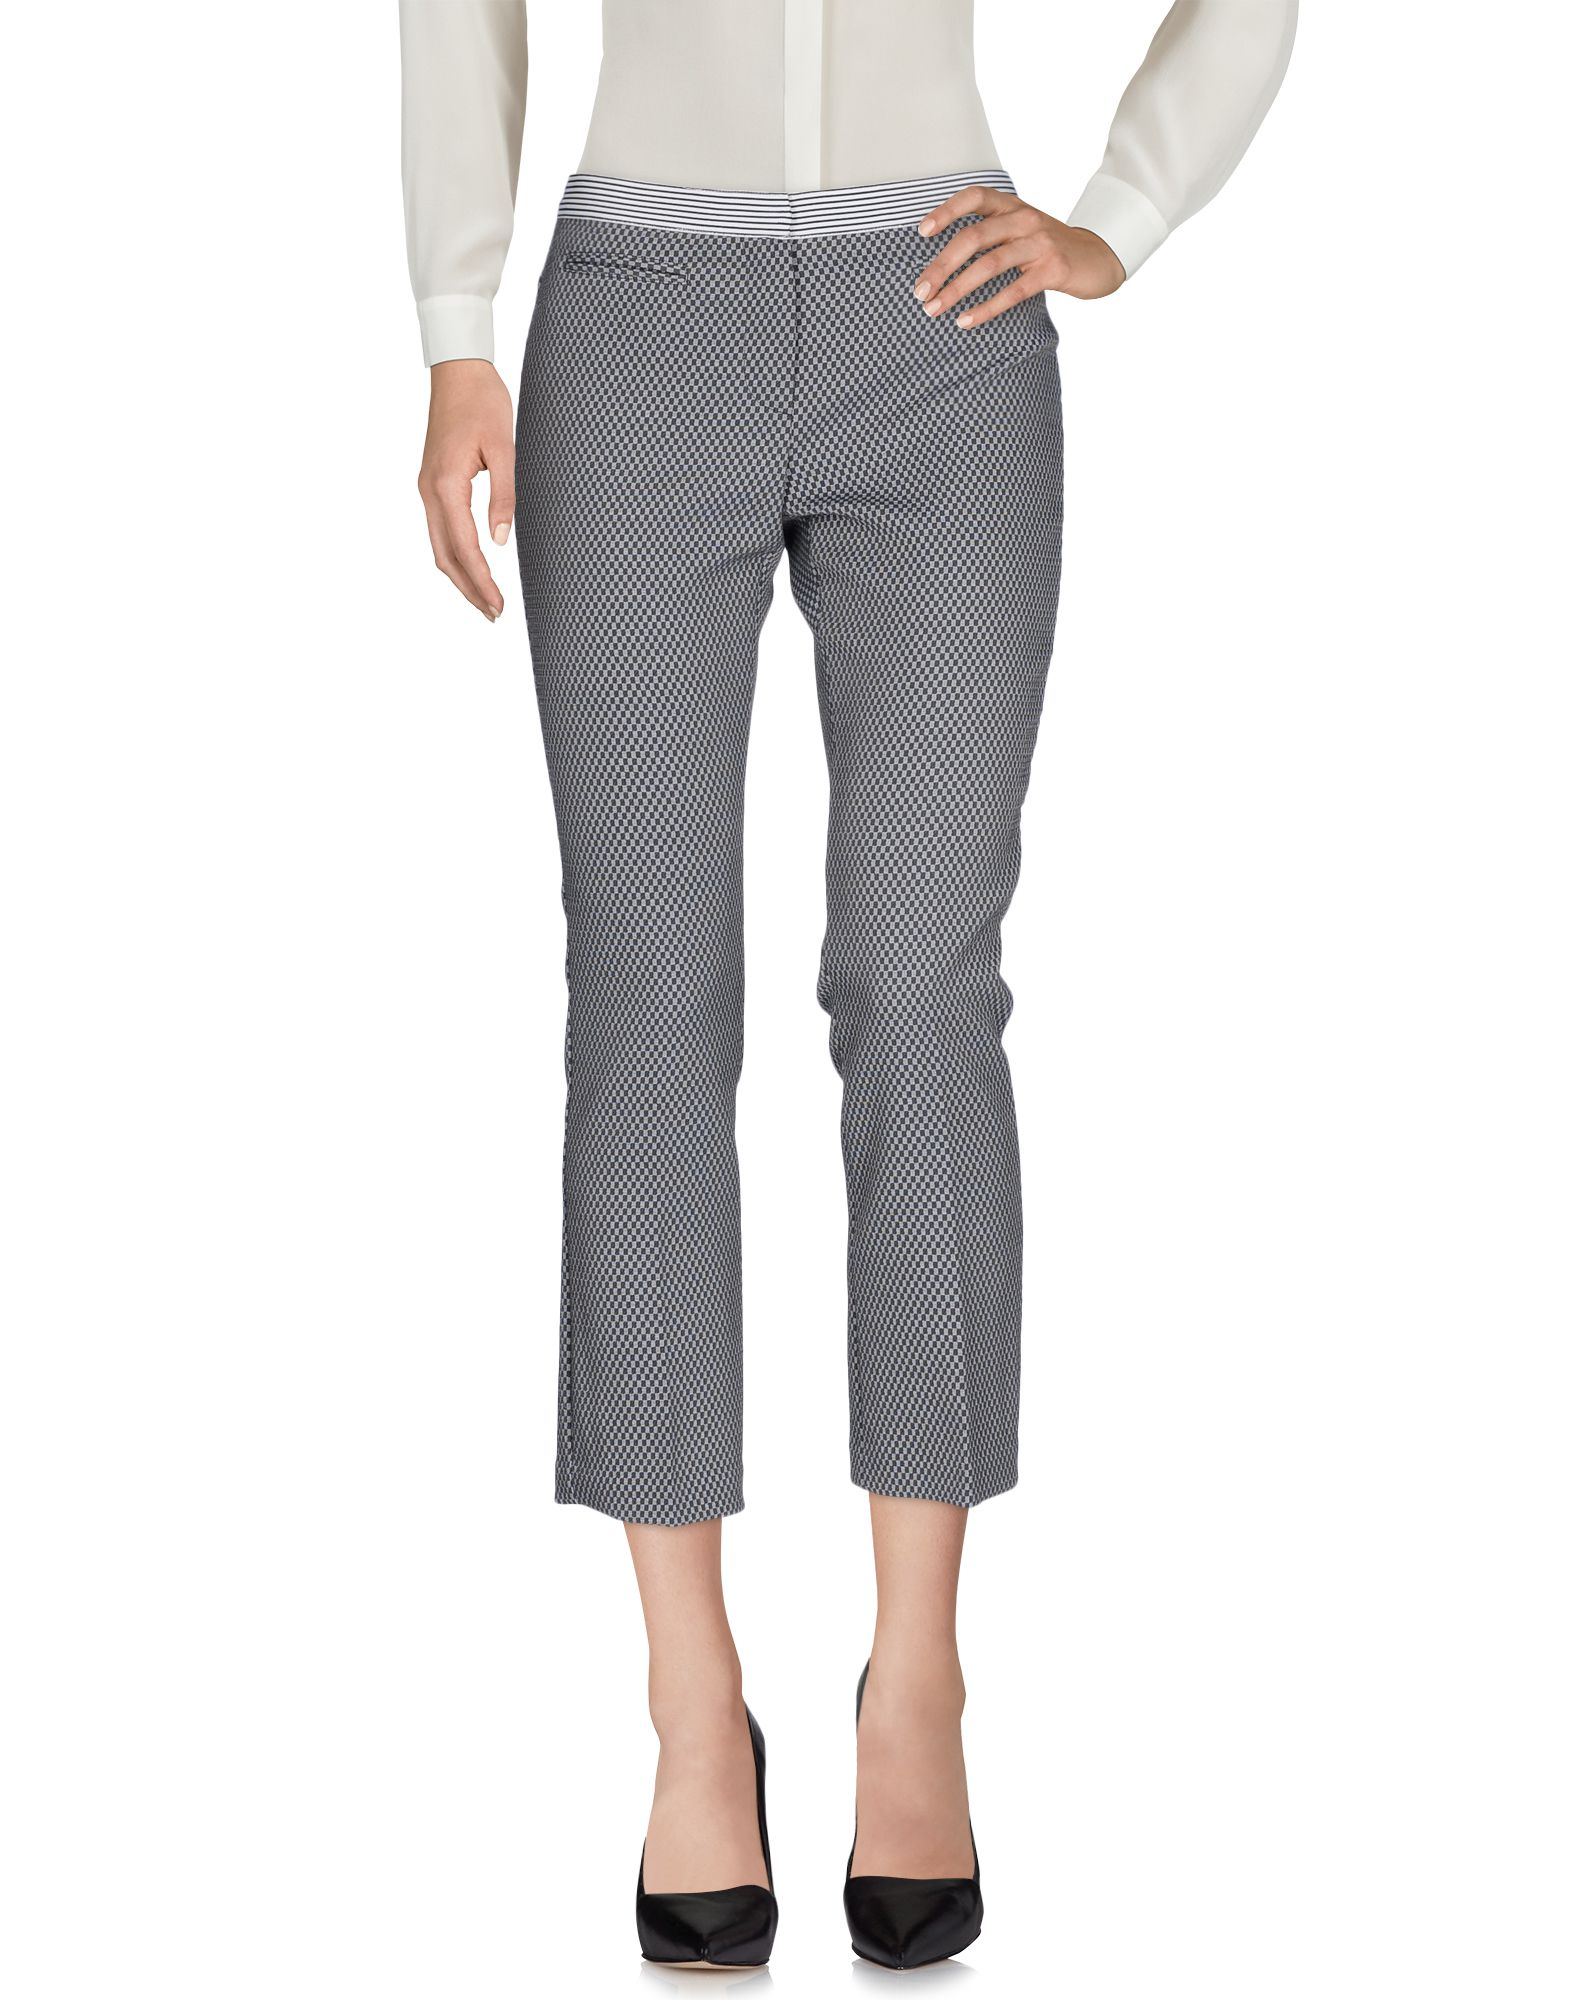 TERESA DAINELLI Casual Pants in Grey